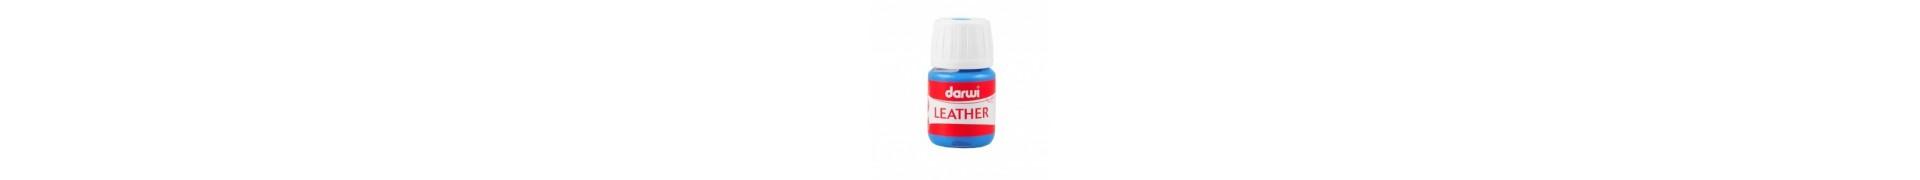 Peinture pour tissu DARWI LEATHER - Peinture pour cuir - Flacon: 30 ml - Bleu clair